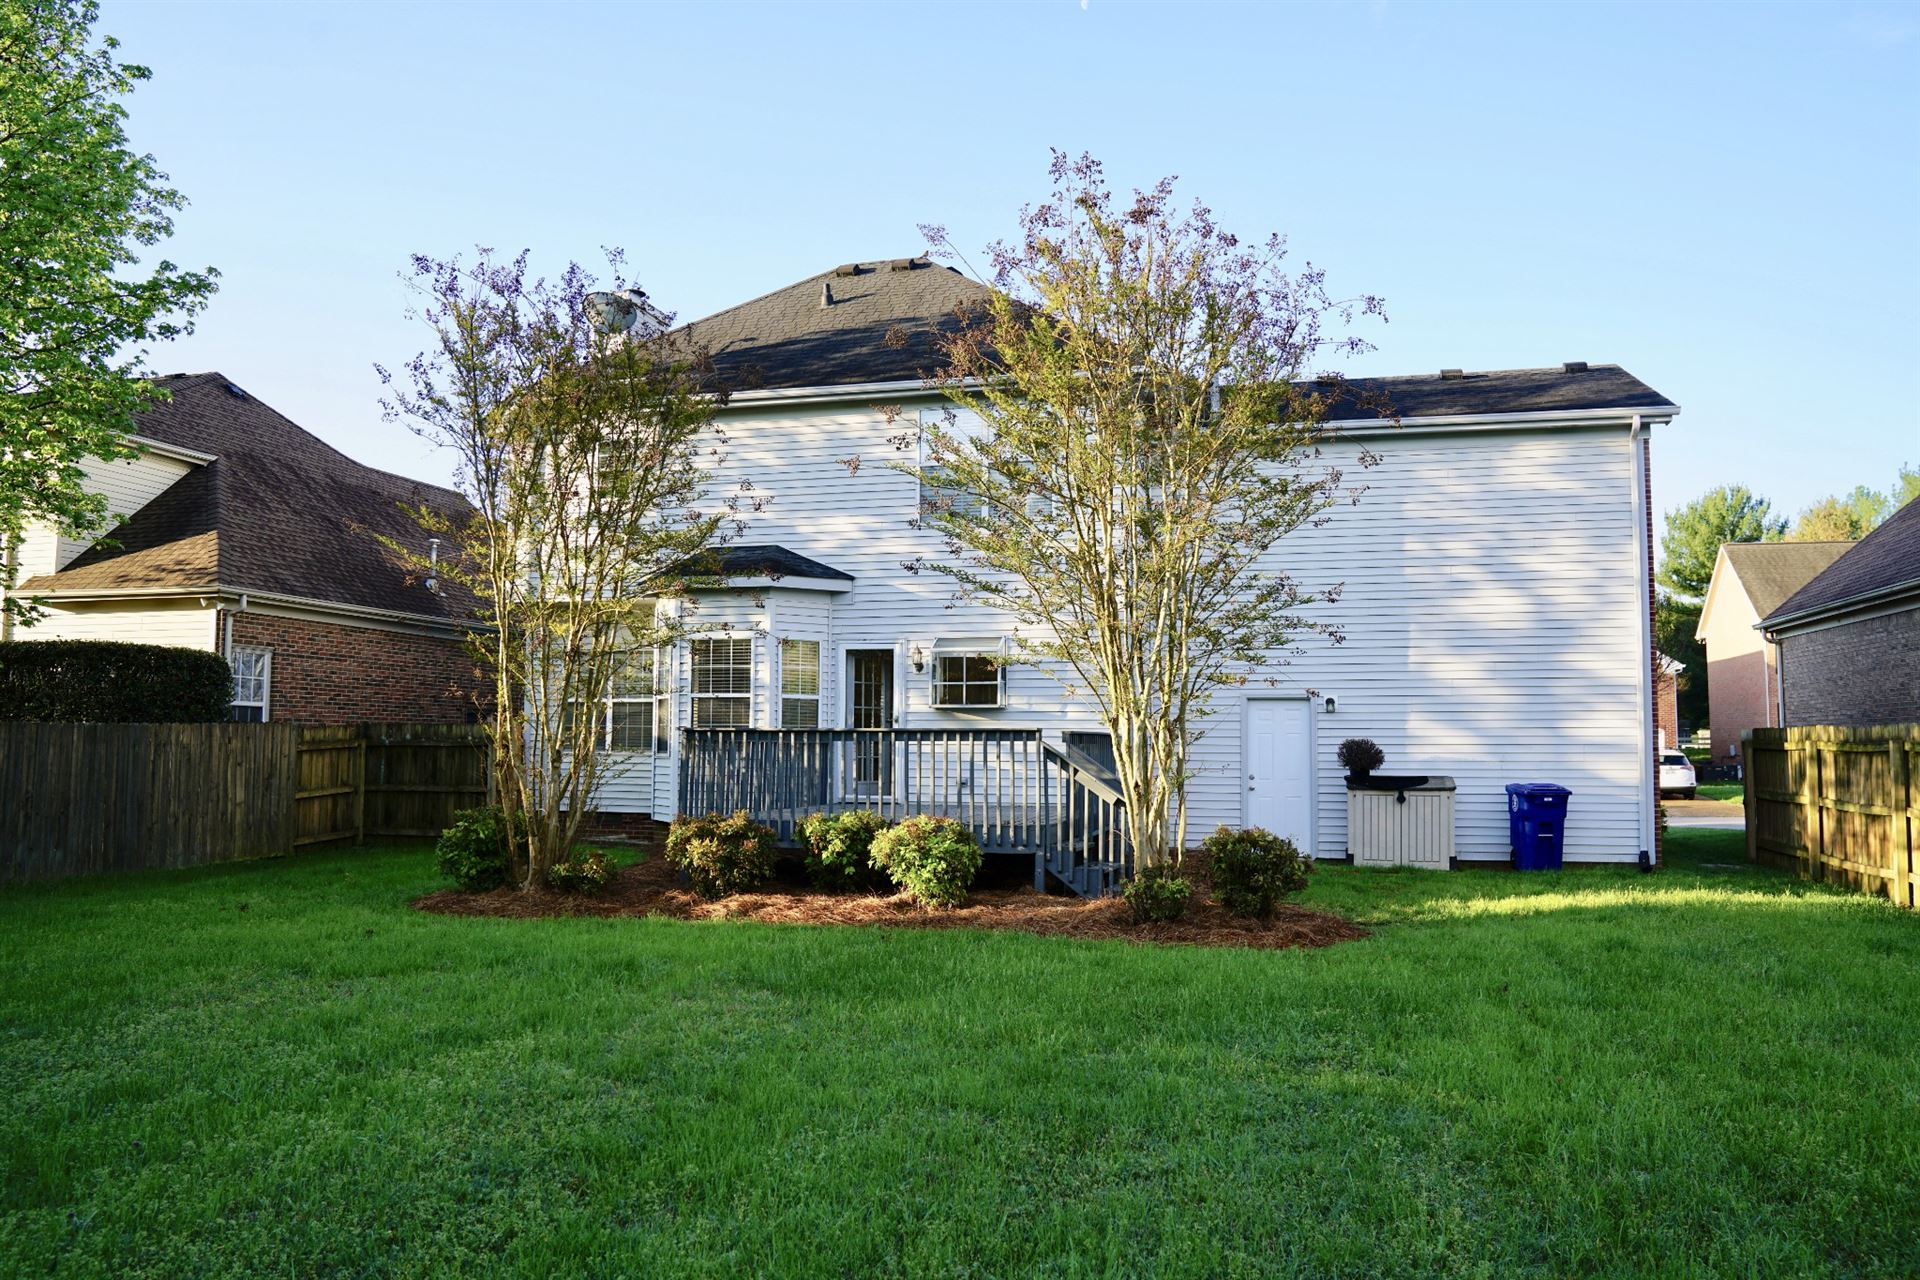 Photo of 177 Crestfield Place, Franklin, TN 37069 (MLS # 2232095)